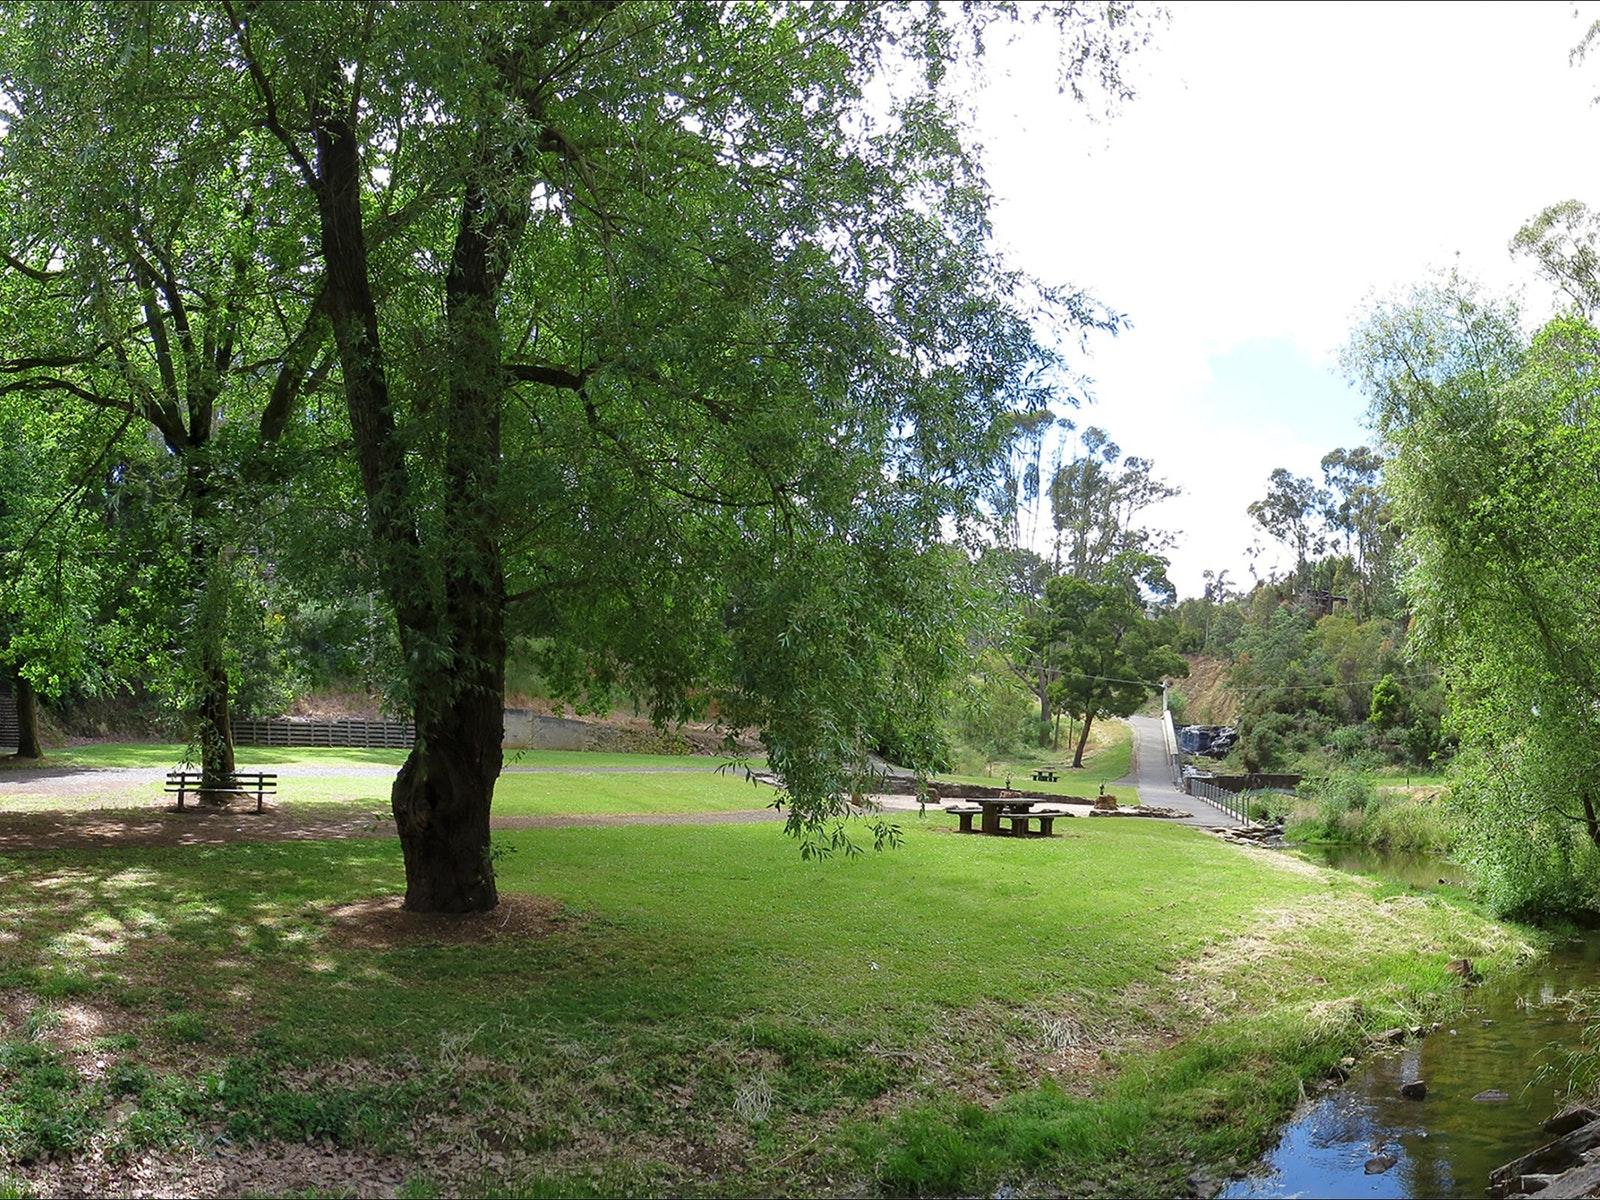 Hepburn Regional Park